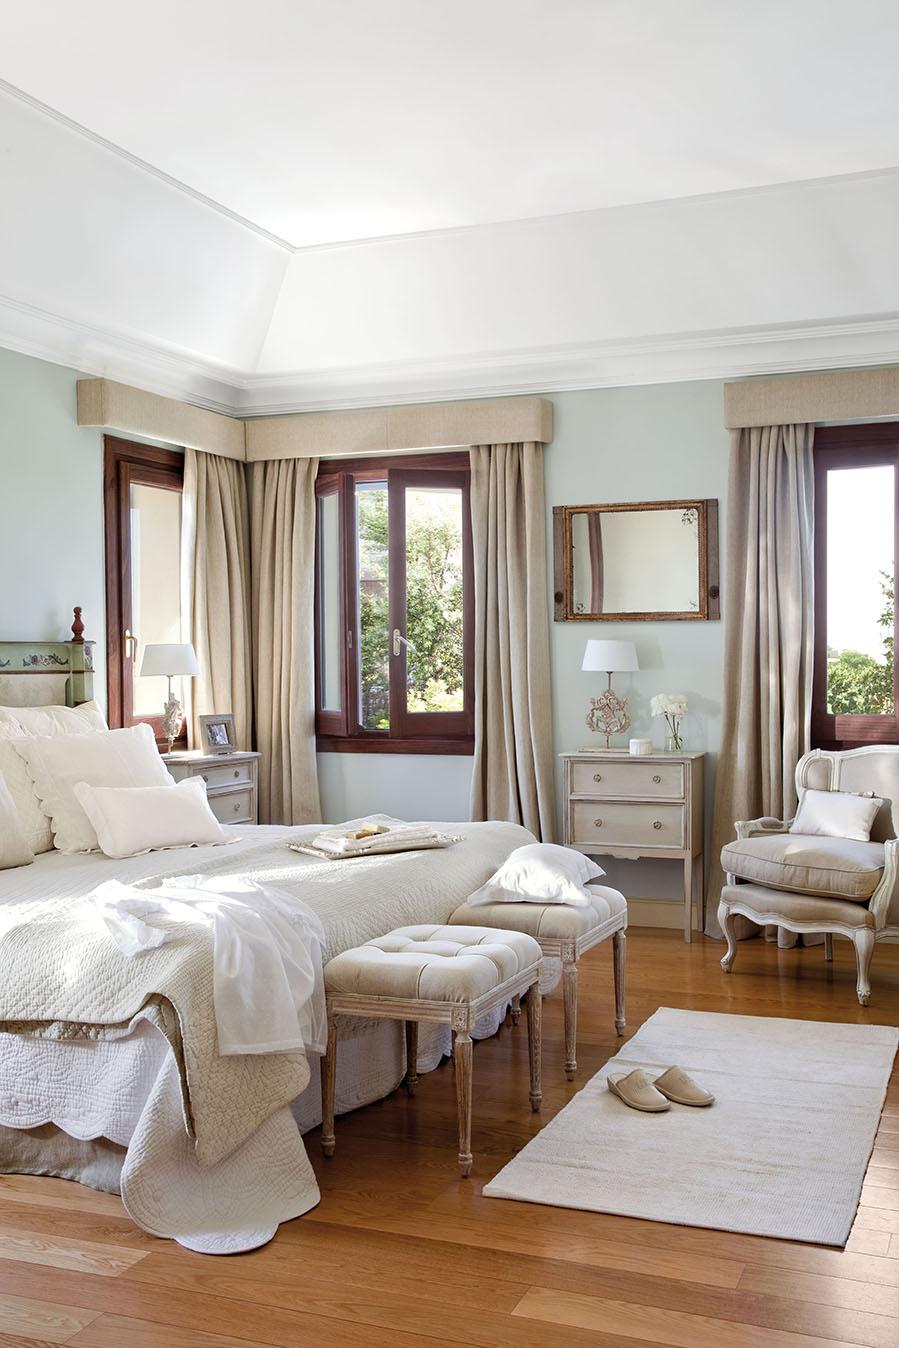 Ikea sillon nios amazing butacas dormitorio baratas para for Sofa ektorp opiniones